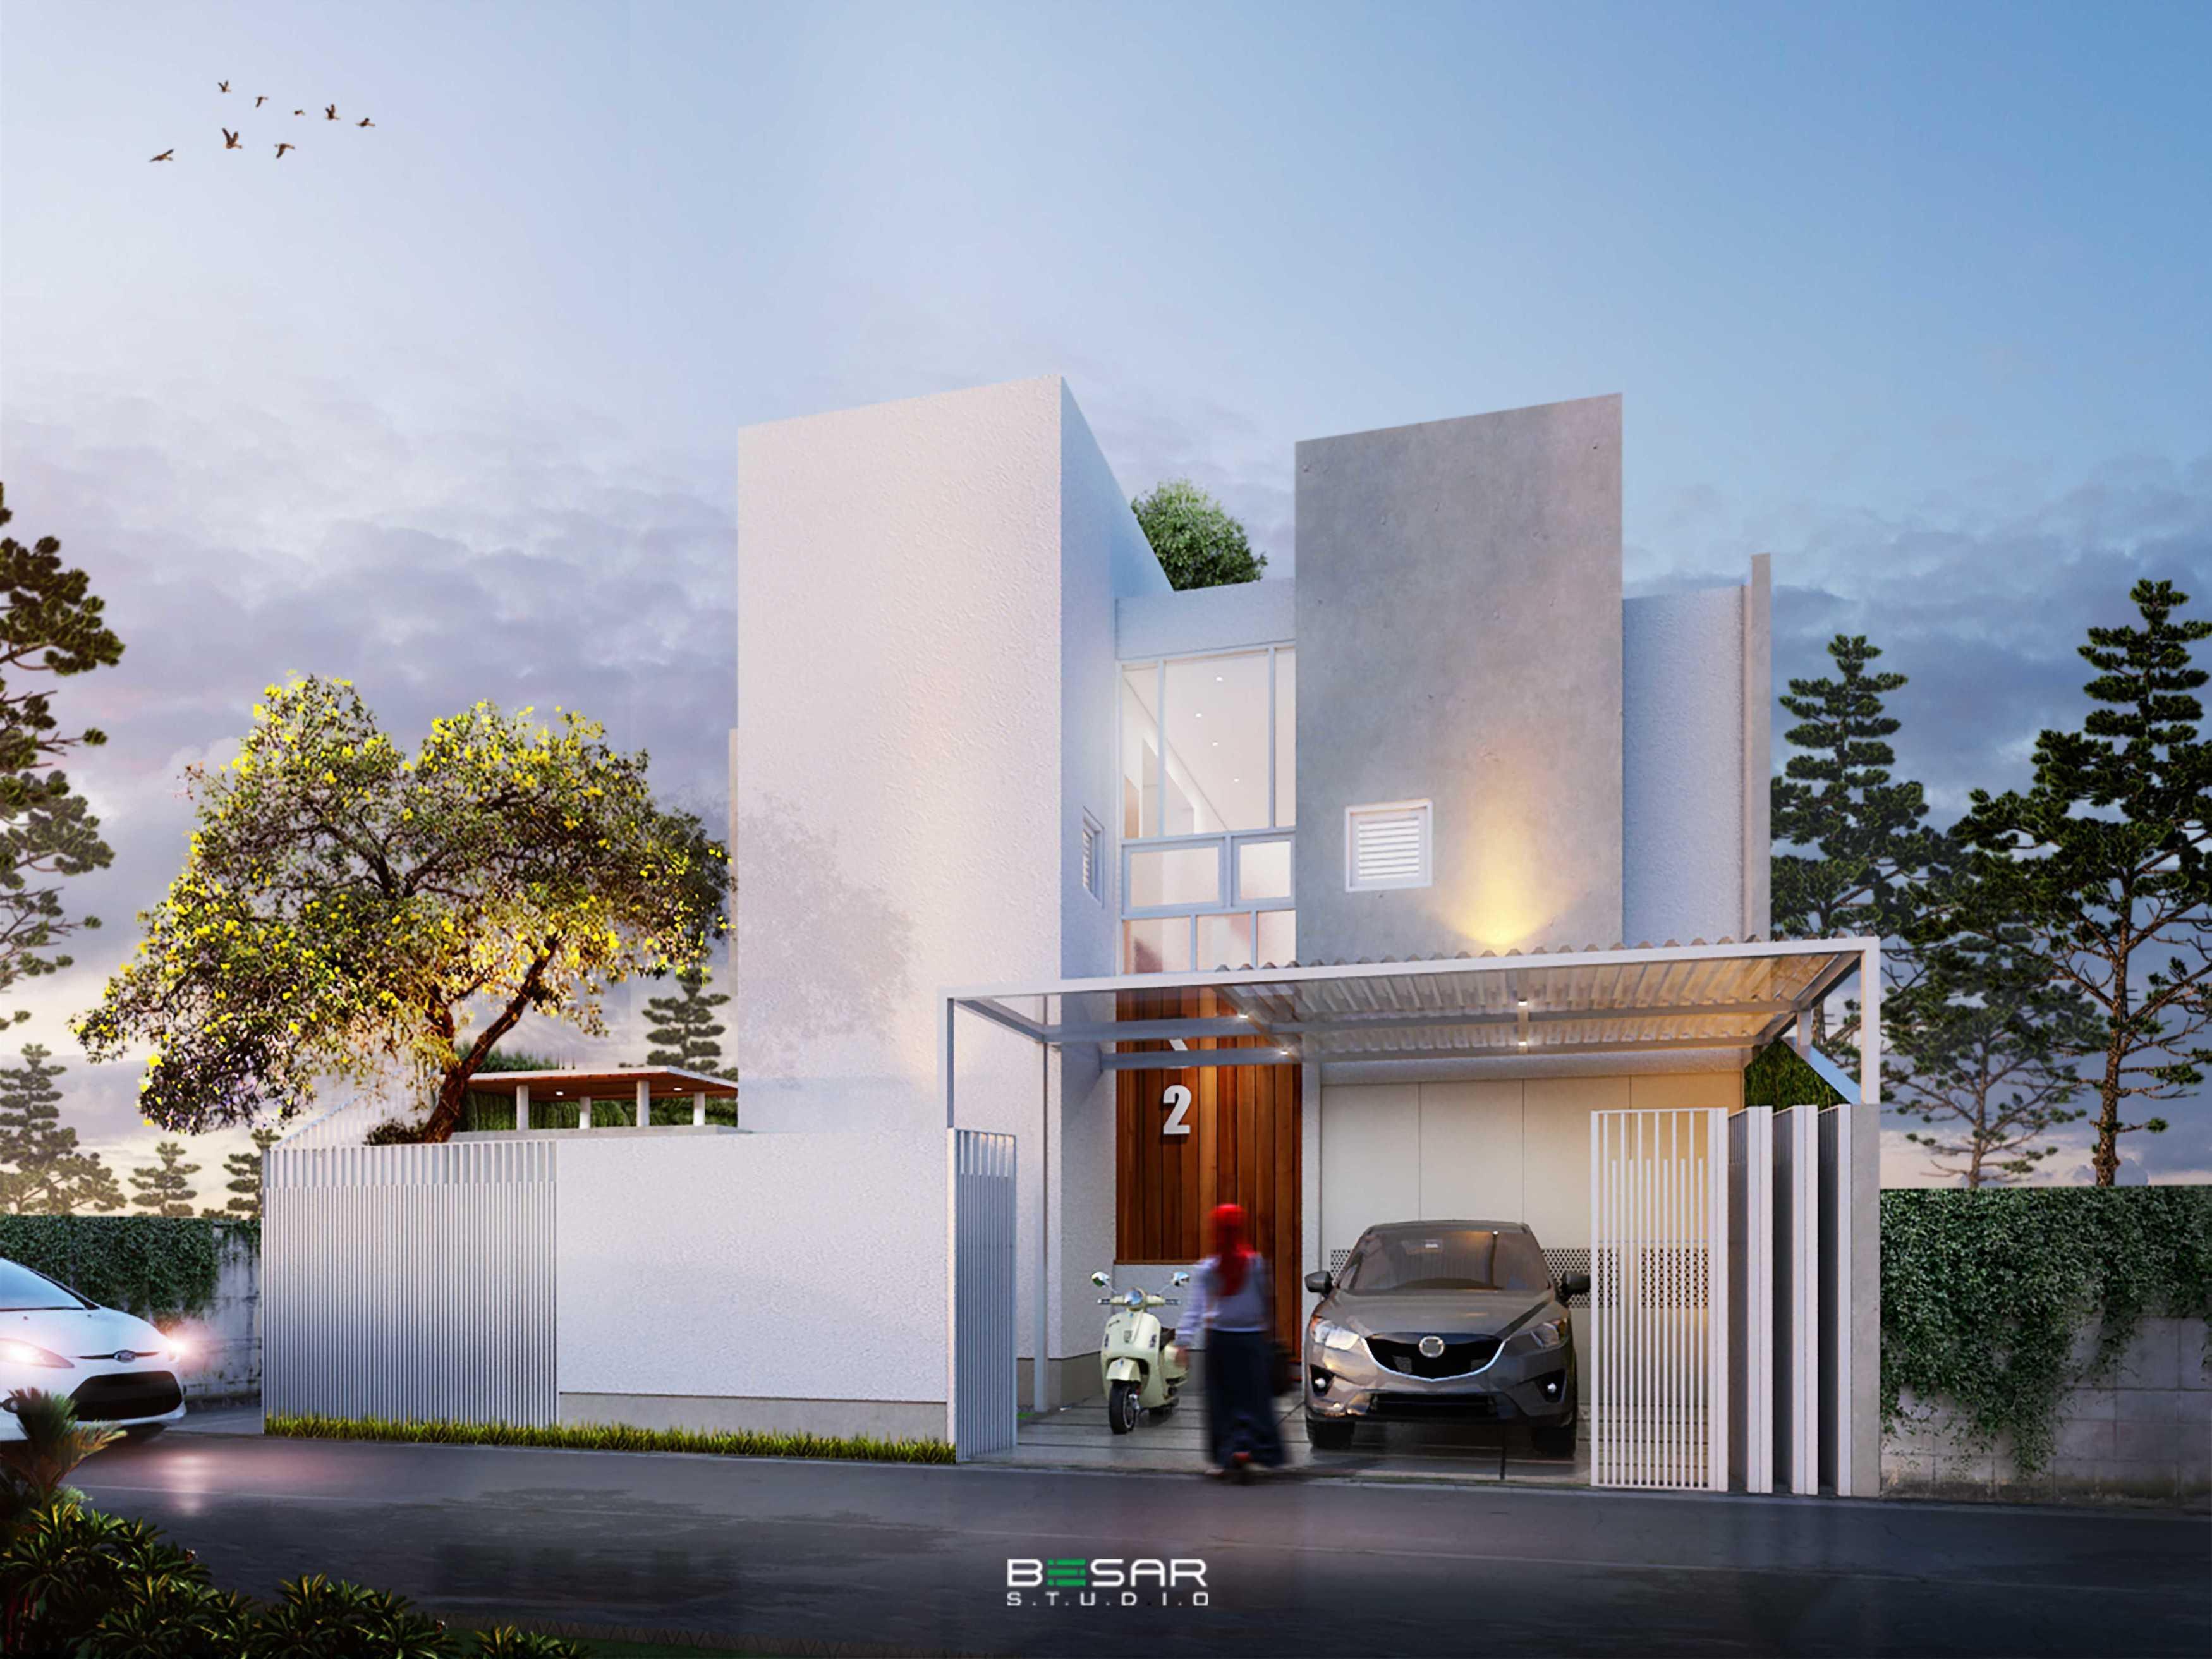 Studio Besar Limo House, Depok Limo, Kota Depok, Jawa Barat, Indonesia Limo, Kota Depok, Jawa Barat, Indonesia Studio-Besar-Limo-House   64828